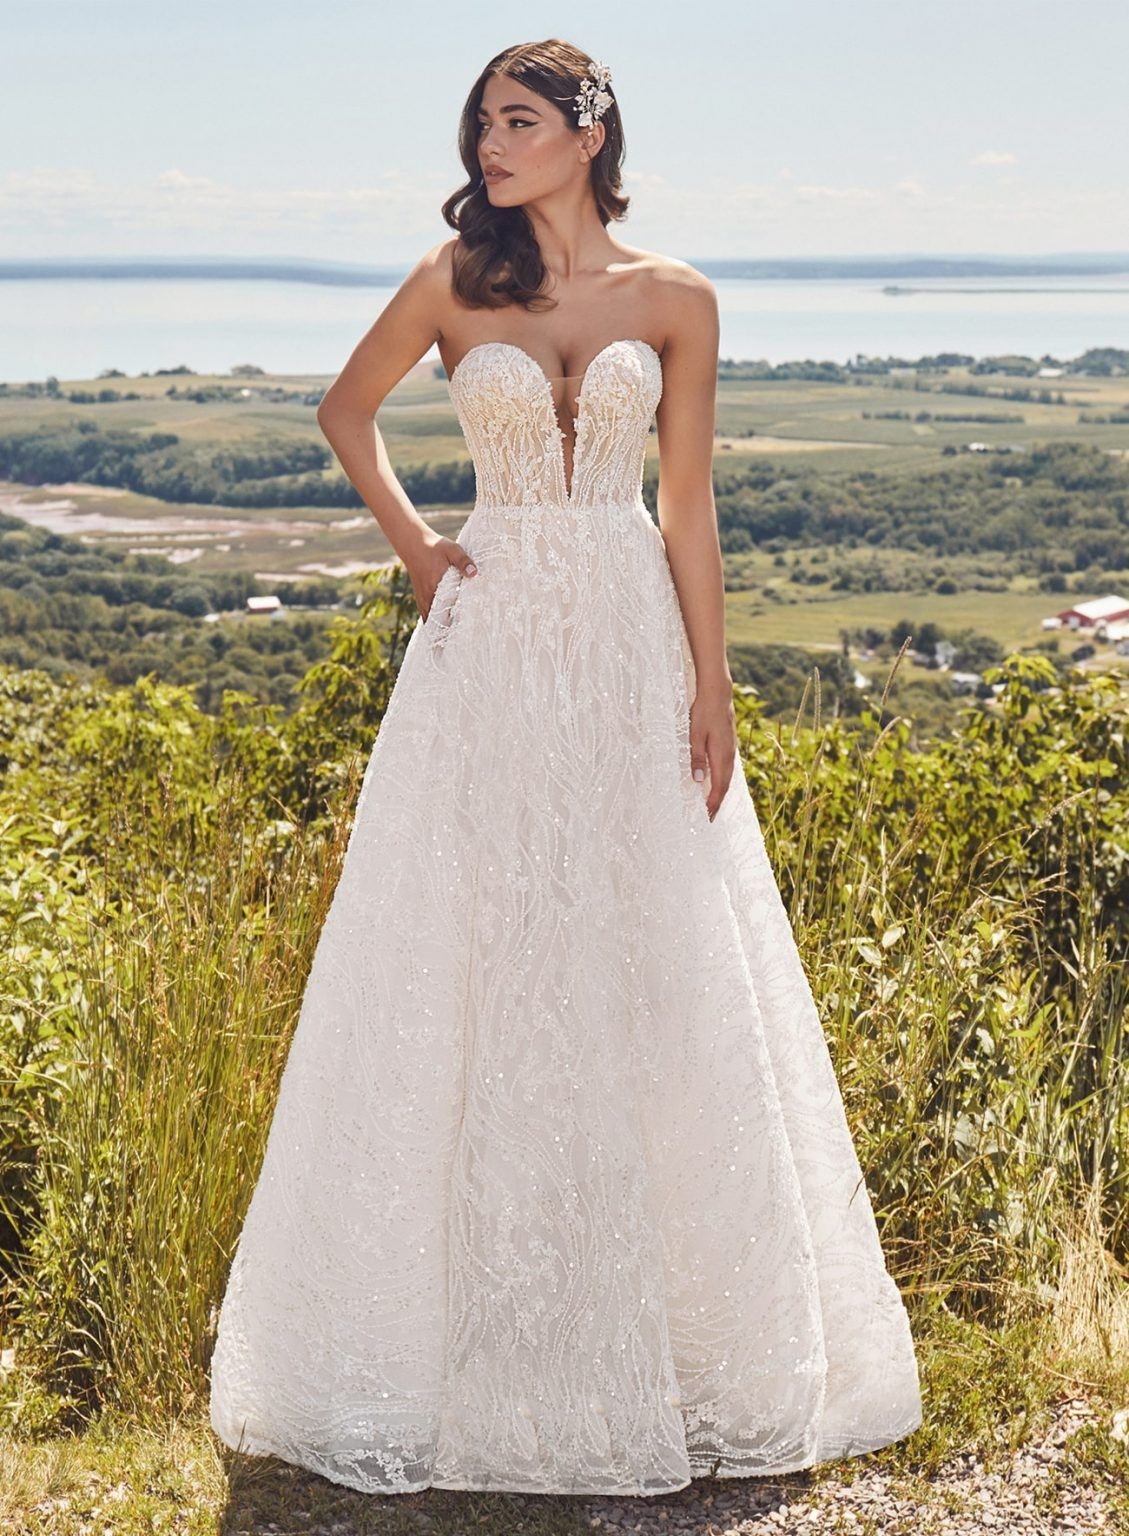 120129 1 In 2021 Womens Wedding Dresses Wedding Dresses Bridal Gallery [ 1536 x 1129 Pixel ]